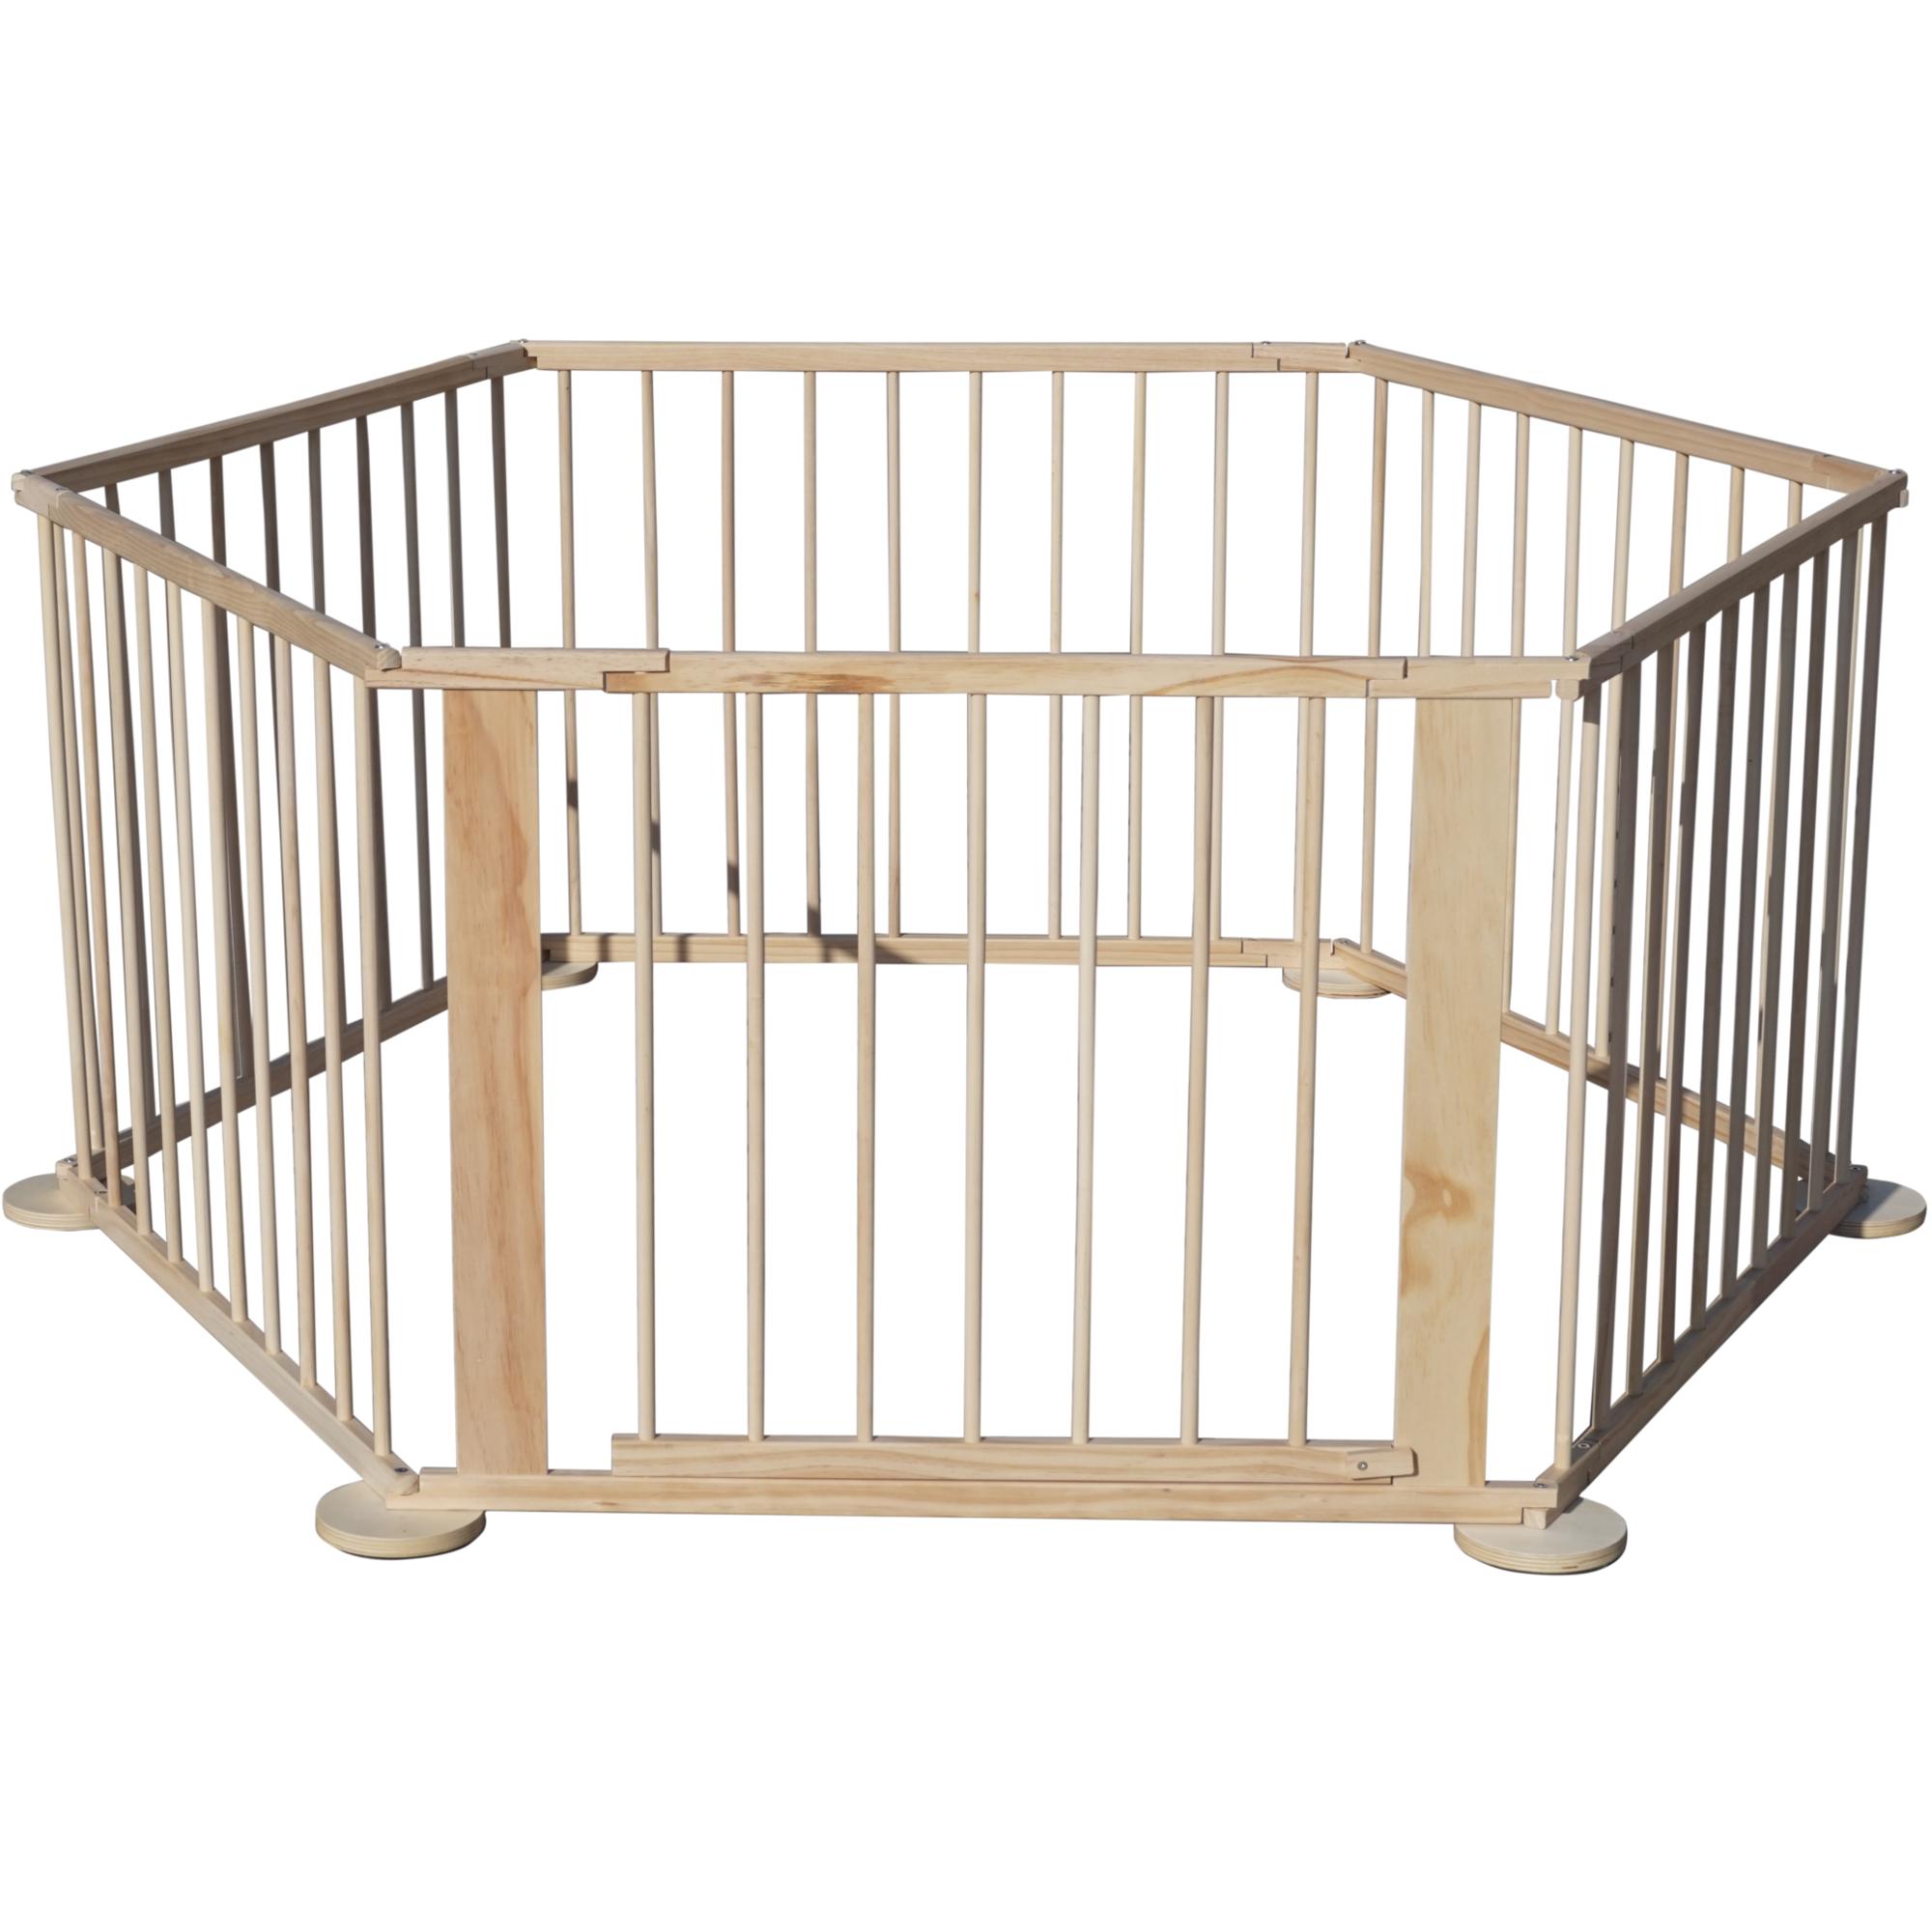 baby laufgitter absperrgitter raumteiler flexibler laufstall t rgitter 6 eck 4260424135658 ebay. Black Bedroom Furniture Sets. Home Design Ideas